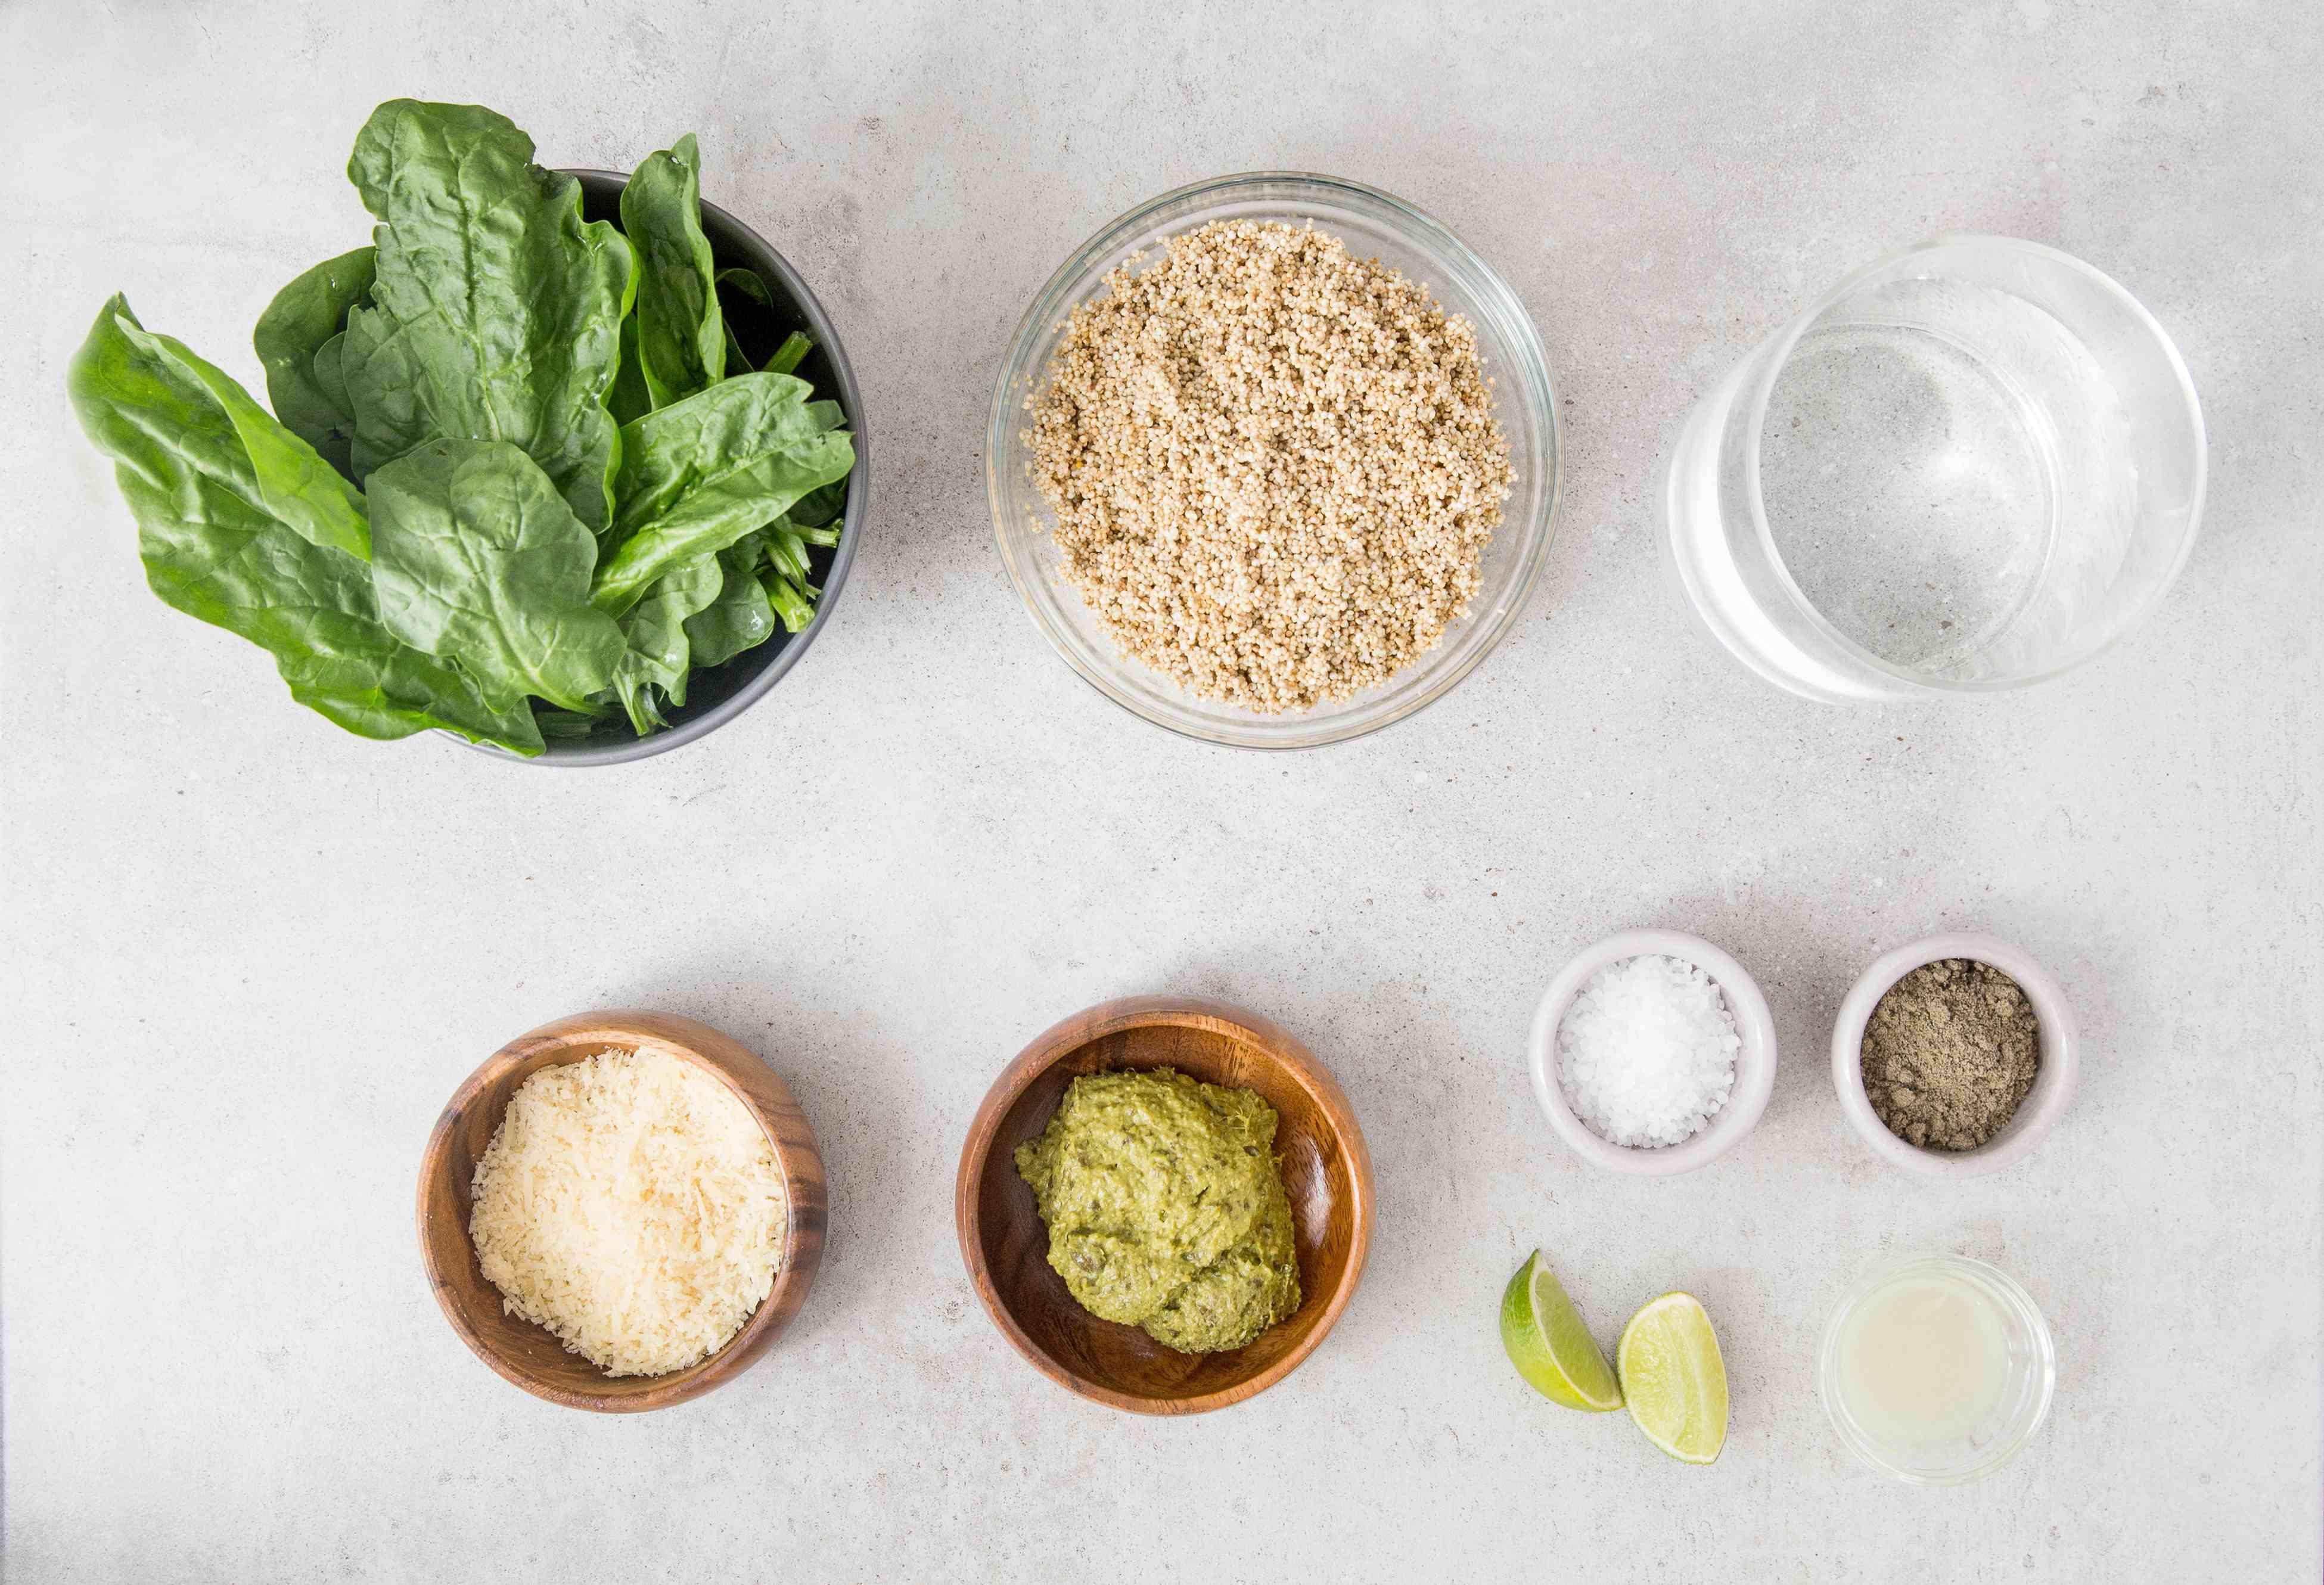 Ingredients for quinoa with pesto